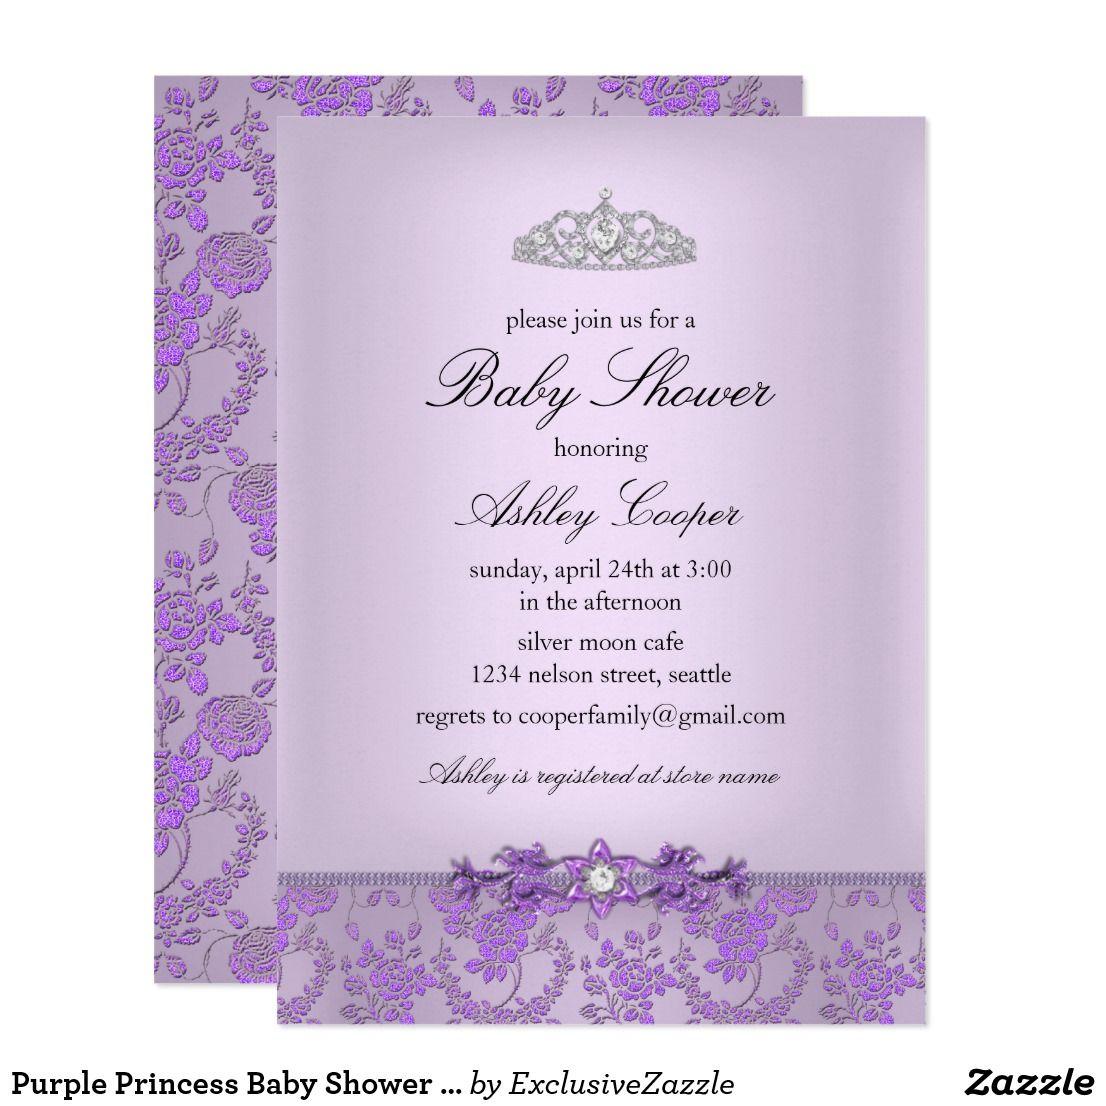 Purple Princess Baby Shower Invitation | Zazzle.com | Purple princess baby  shower, Princess baby shower invitation, Purple princess baby shower  invitations